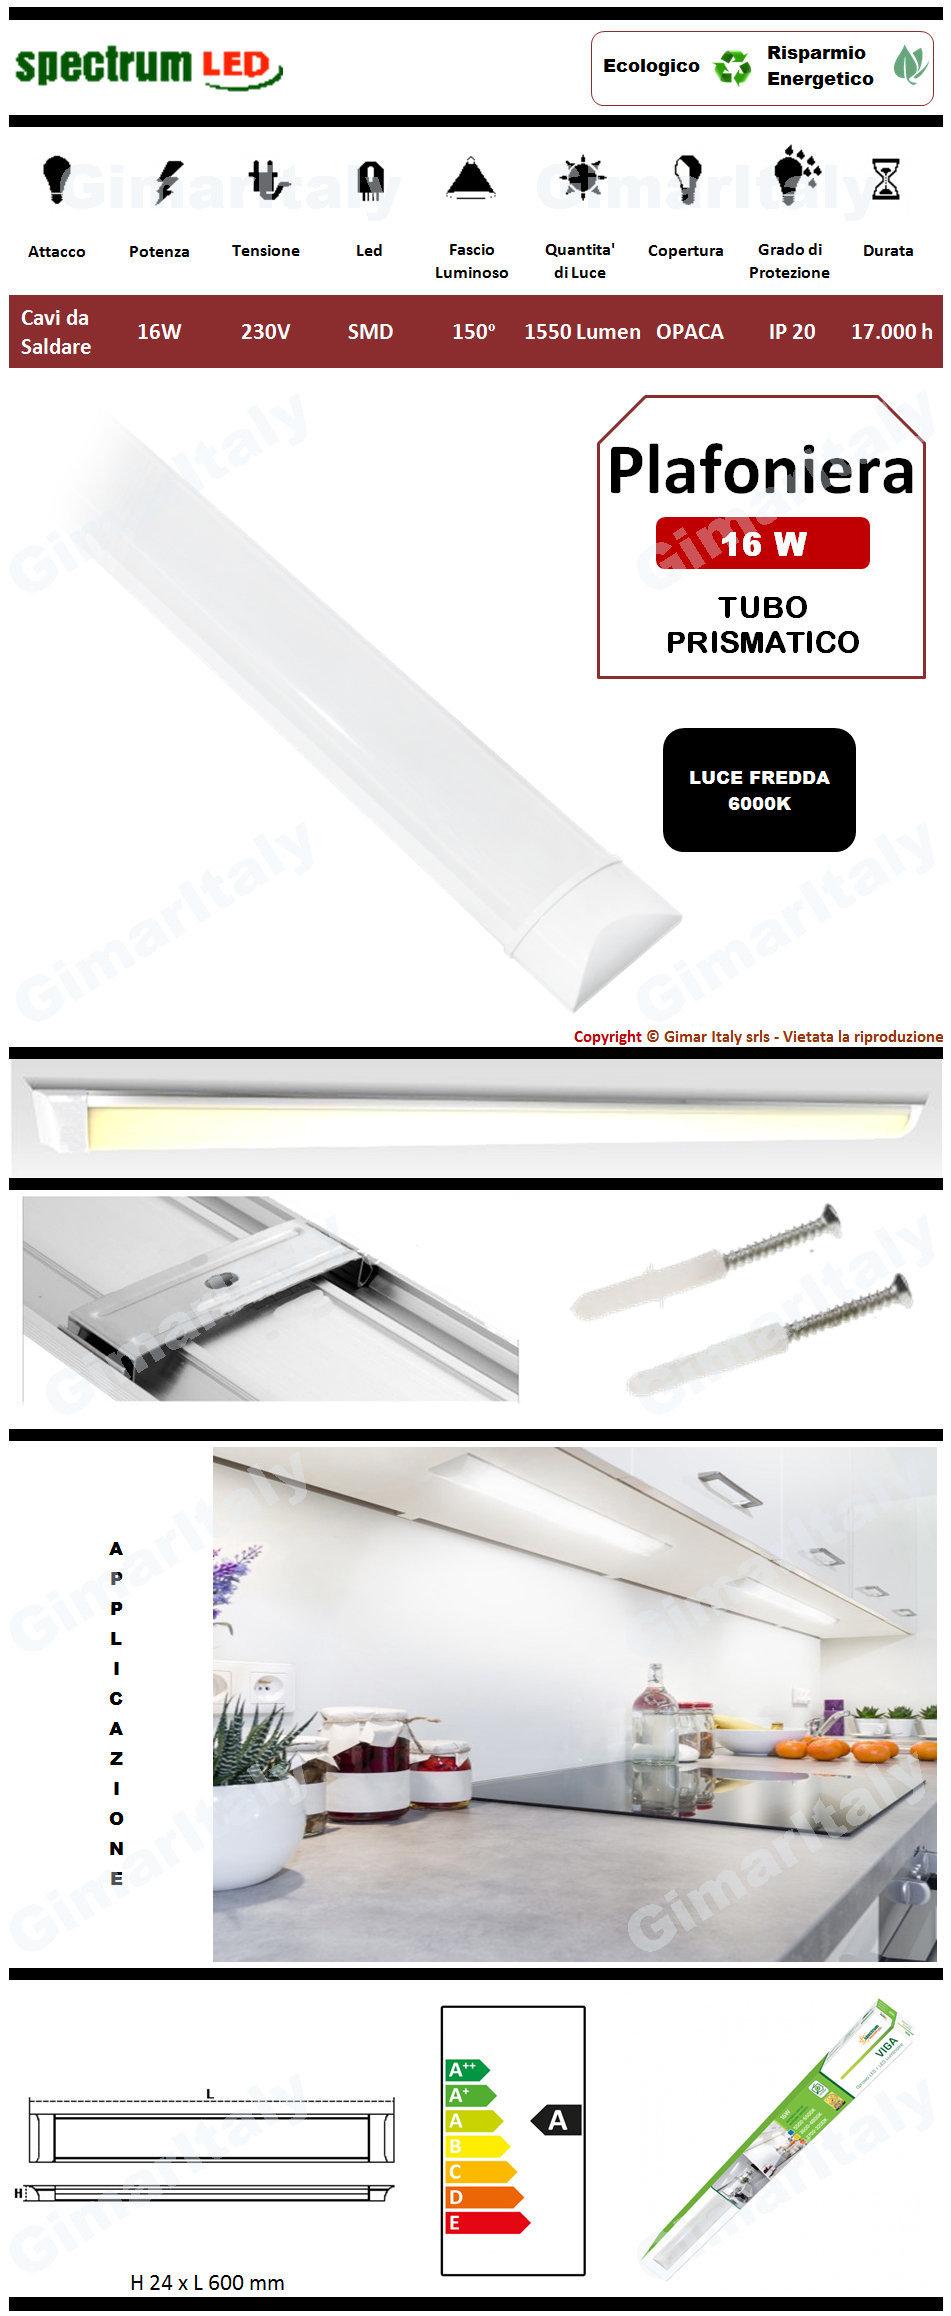 Plafoniera Led Tubo Prismatico Viga 16W 60 cm luce fredda Spectrum